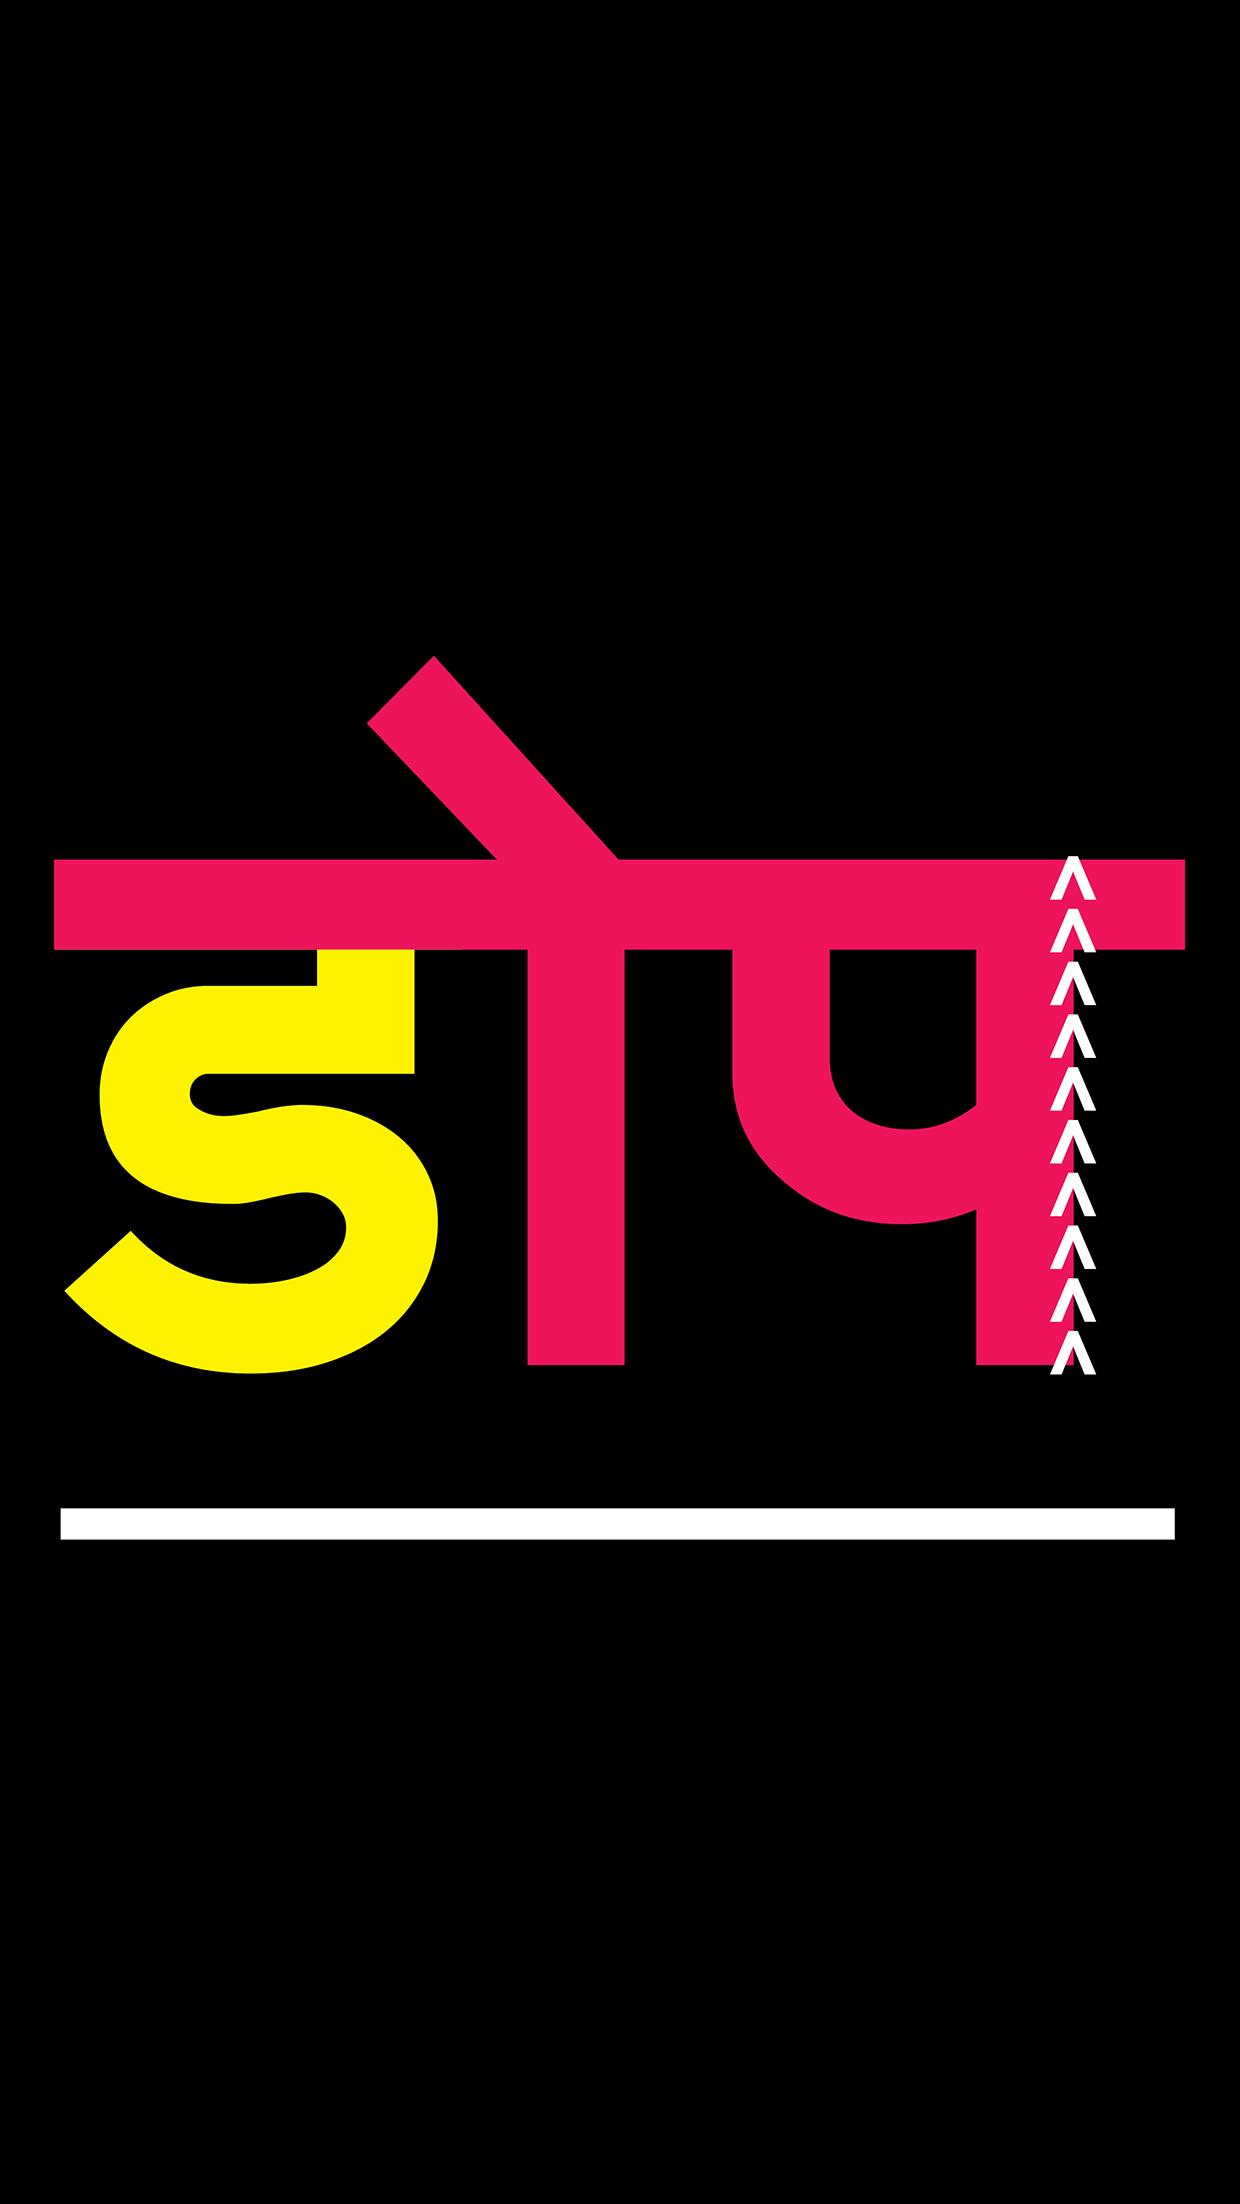 Pin by Himish Jain on Hindi Typography⭐Desi Swag⭐ Funny